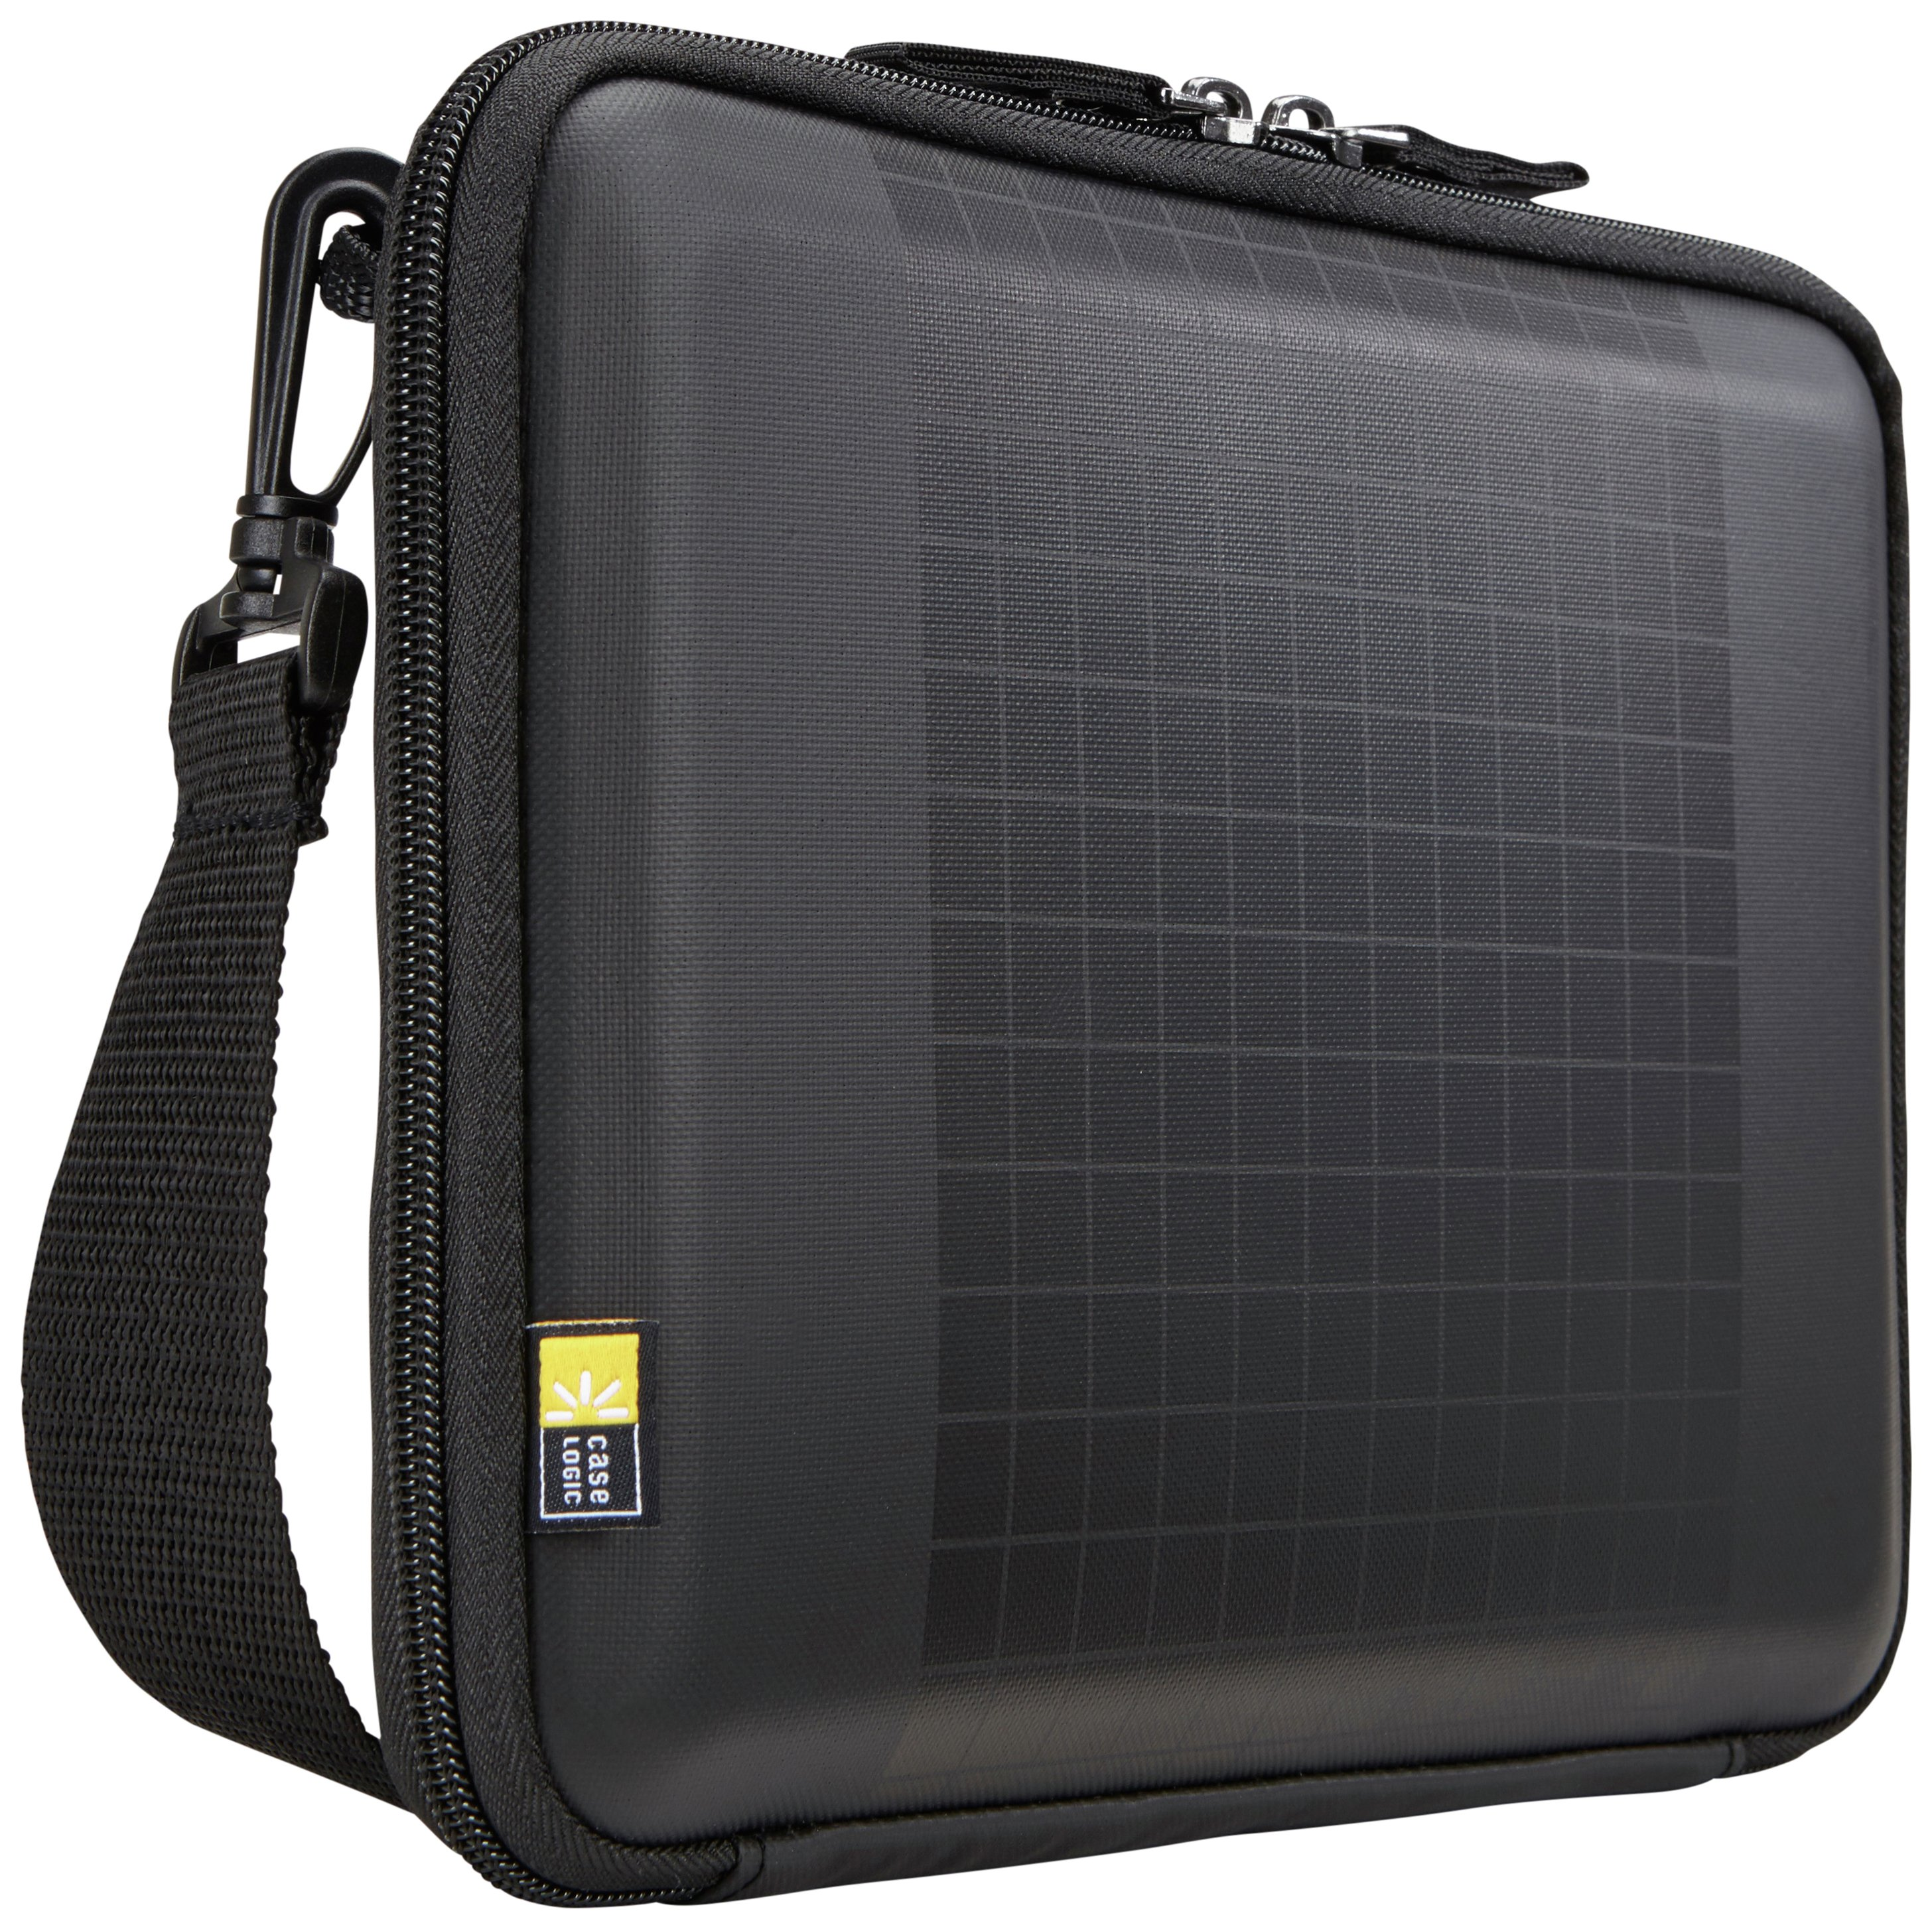 White apron argos - Case Logic Arca 10 Inch Carrying Case Black